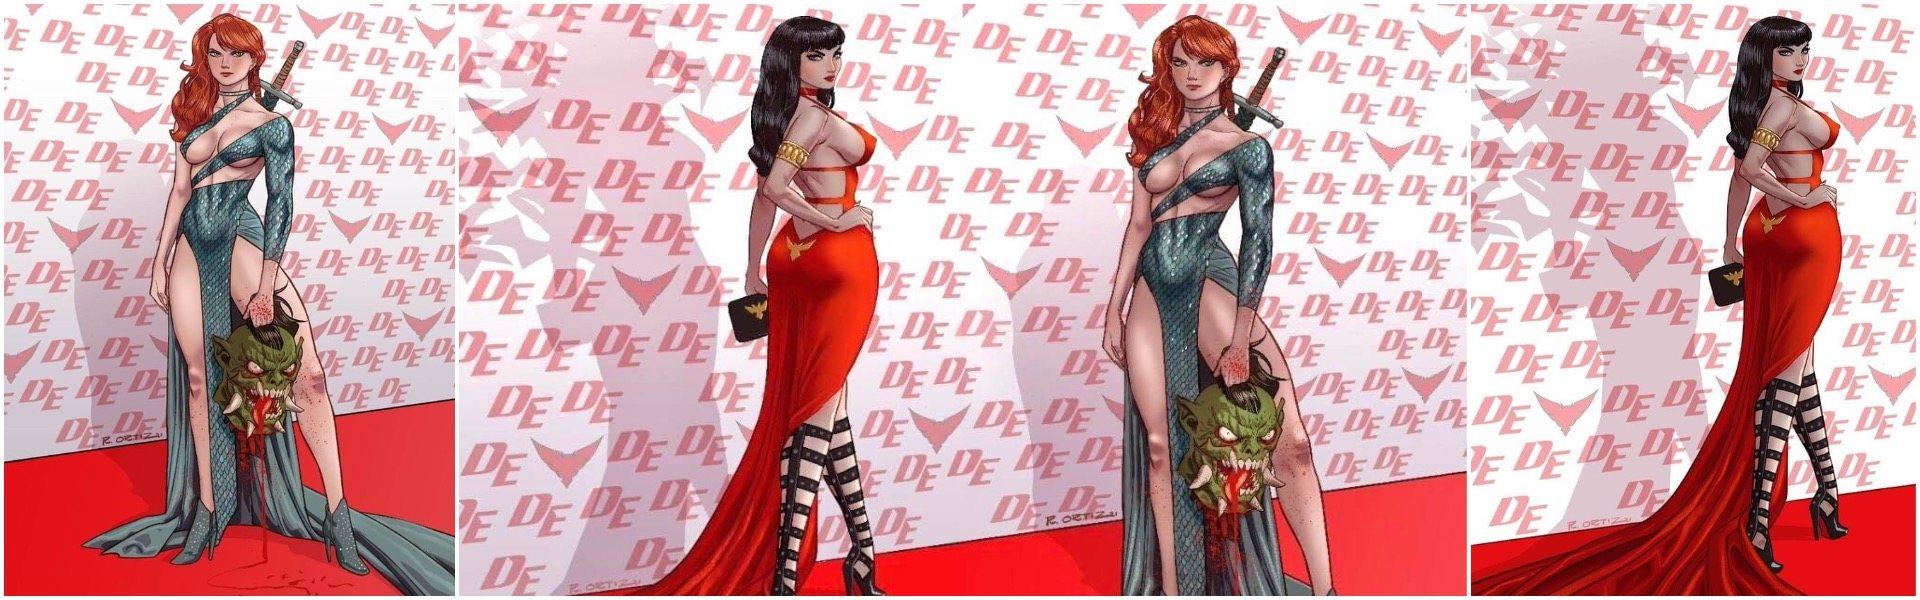 Vampirella and Red Sonja Richard Ortiz Red Carpet Variant Exclusives